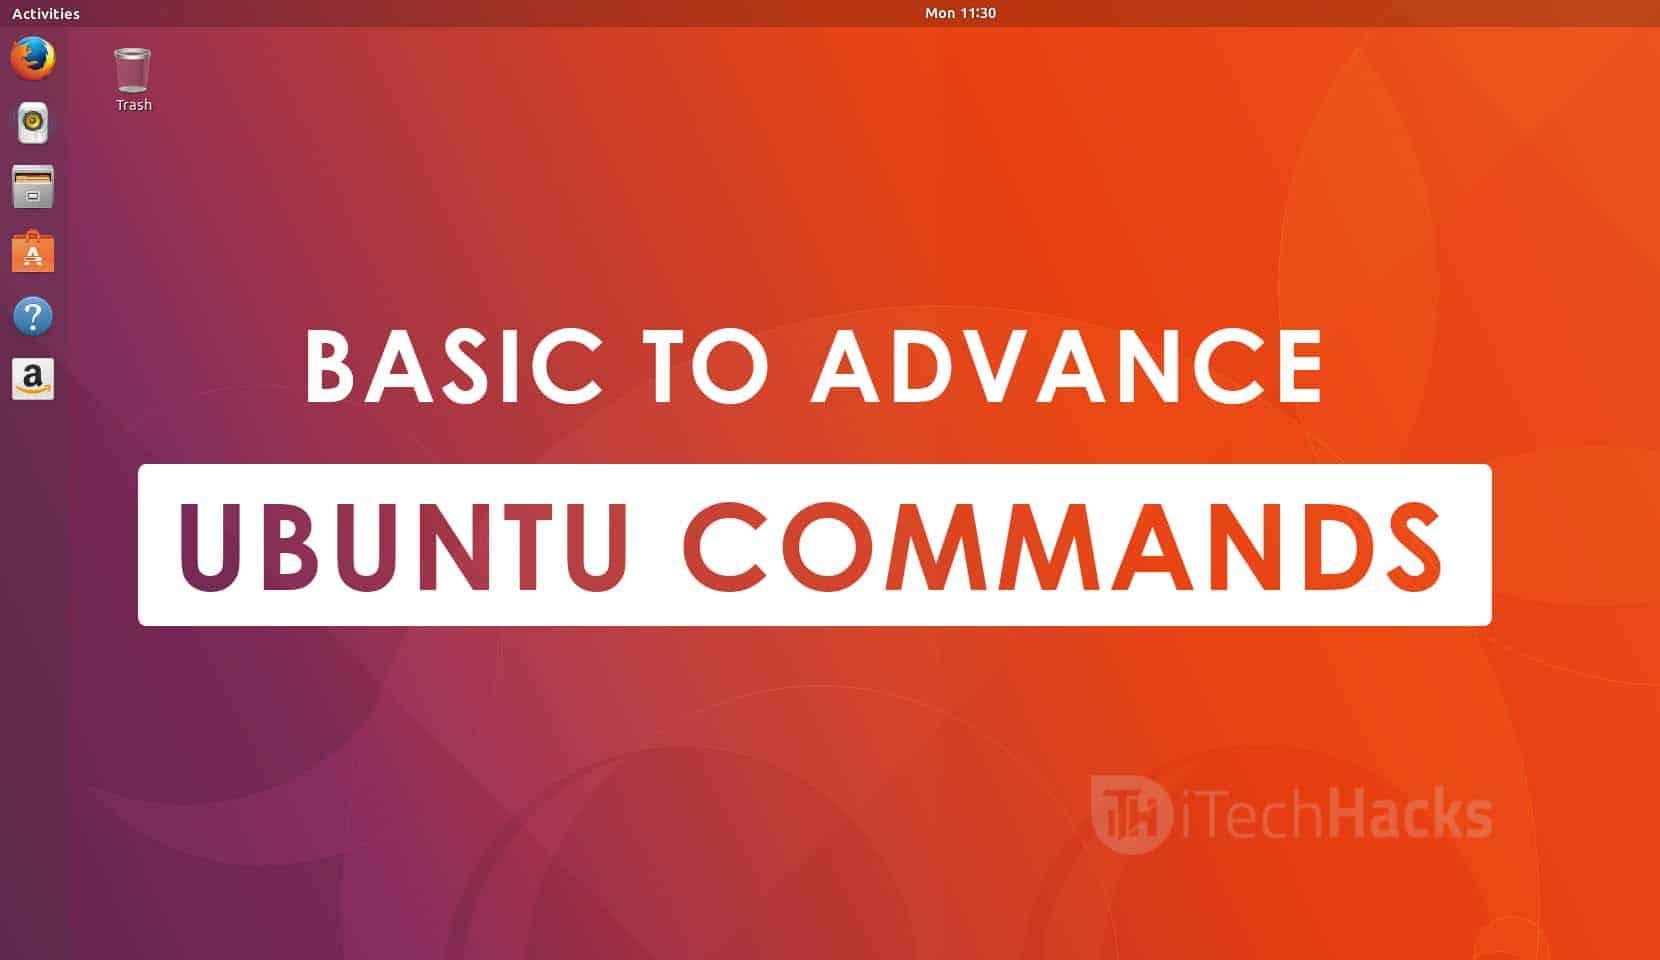 25 Top Ubuntu Commands & Shortcuts: Basic to Advance